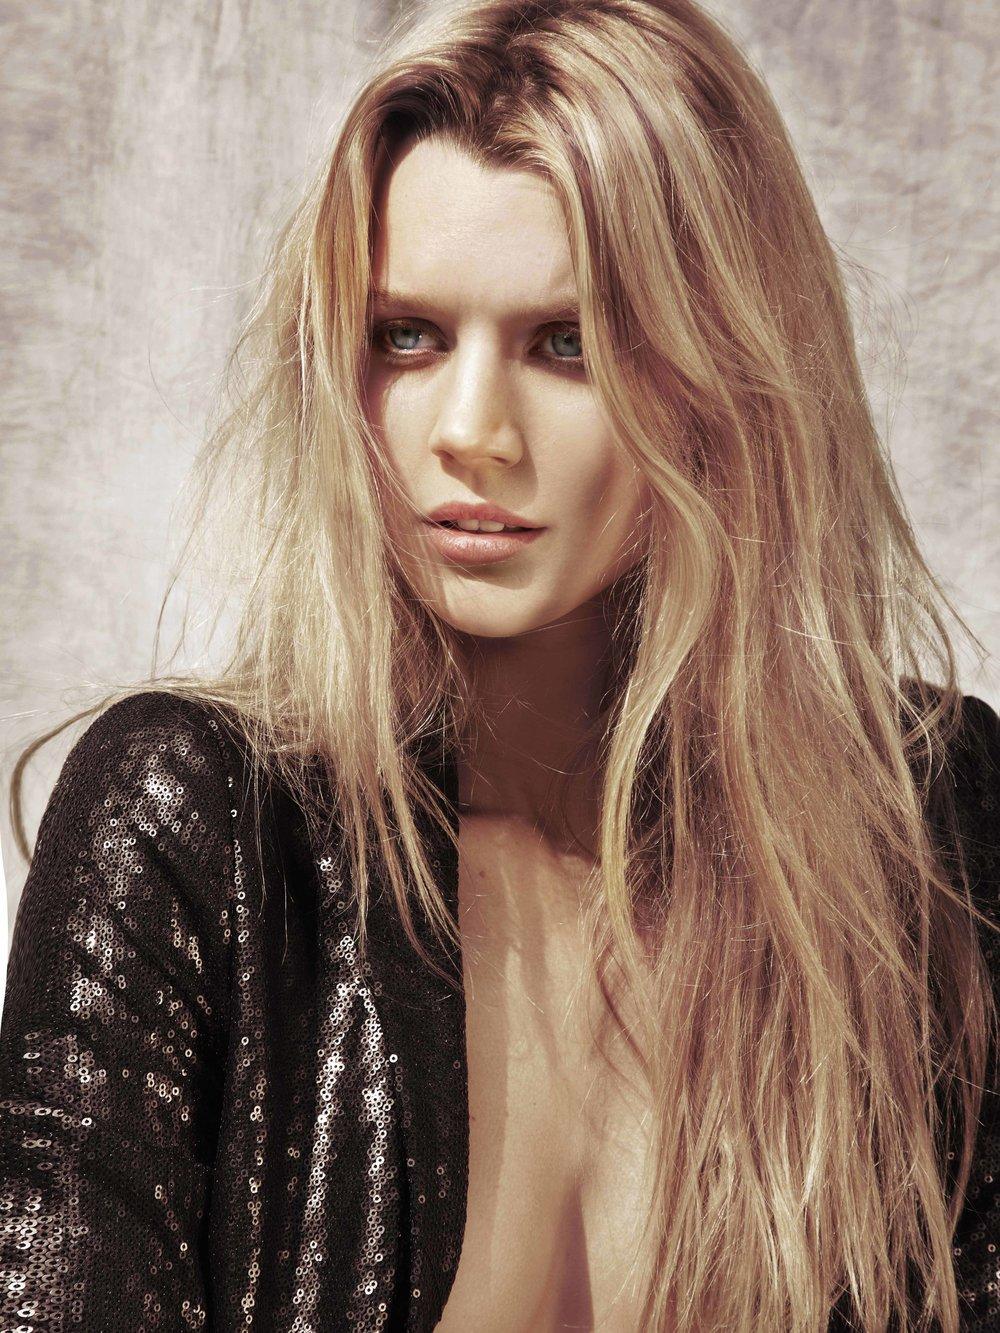 Andrea-Bowman-Carter Jayne Moore blonde bombshell beach blonde boho blonde blond hair loose styling textured hair balayage sexy blonde bridgitte bardot